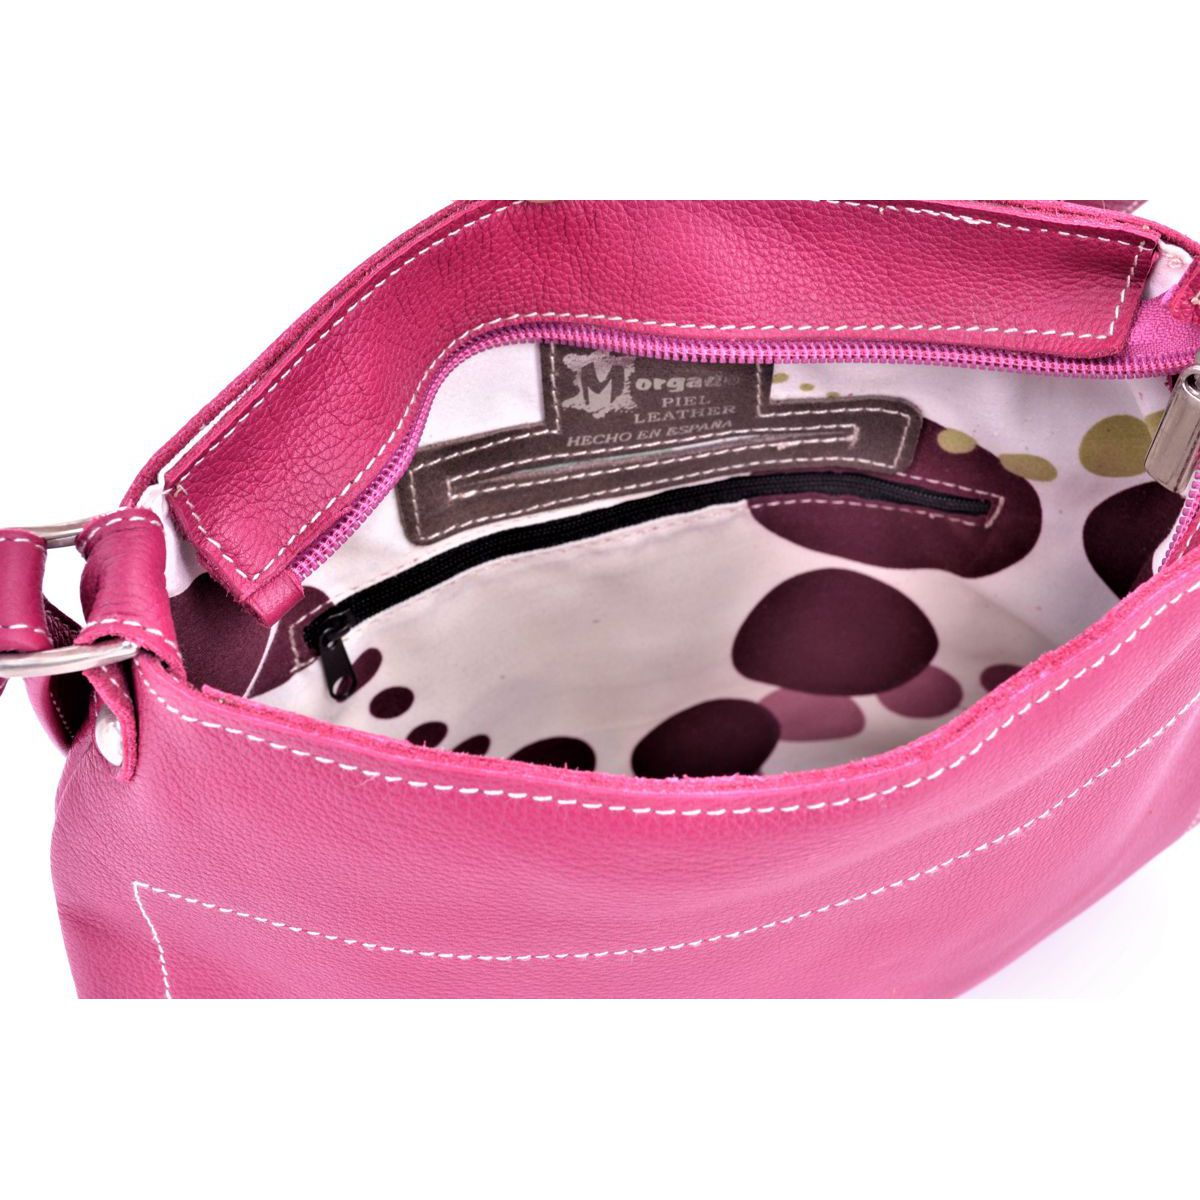 Morgado leather bag with shoulder strap Fuchsia BRASS Workshop